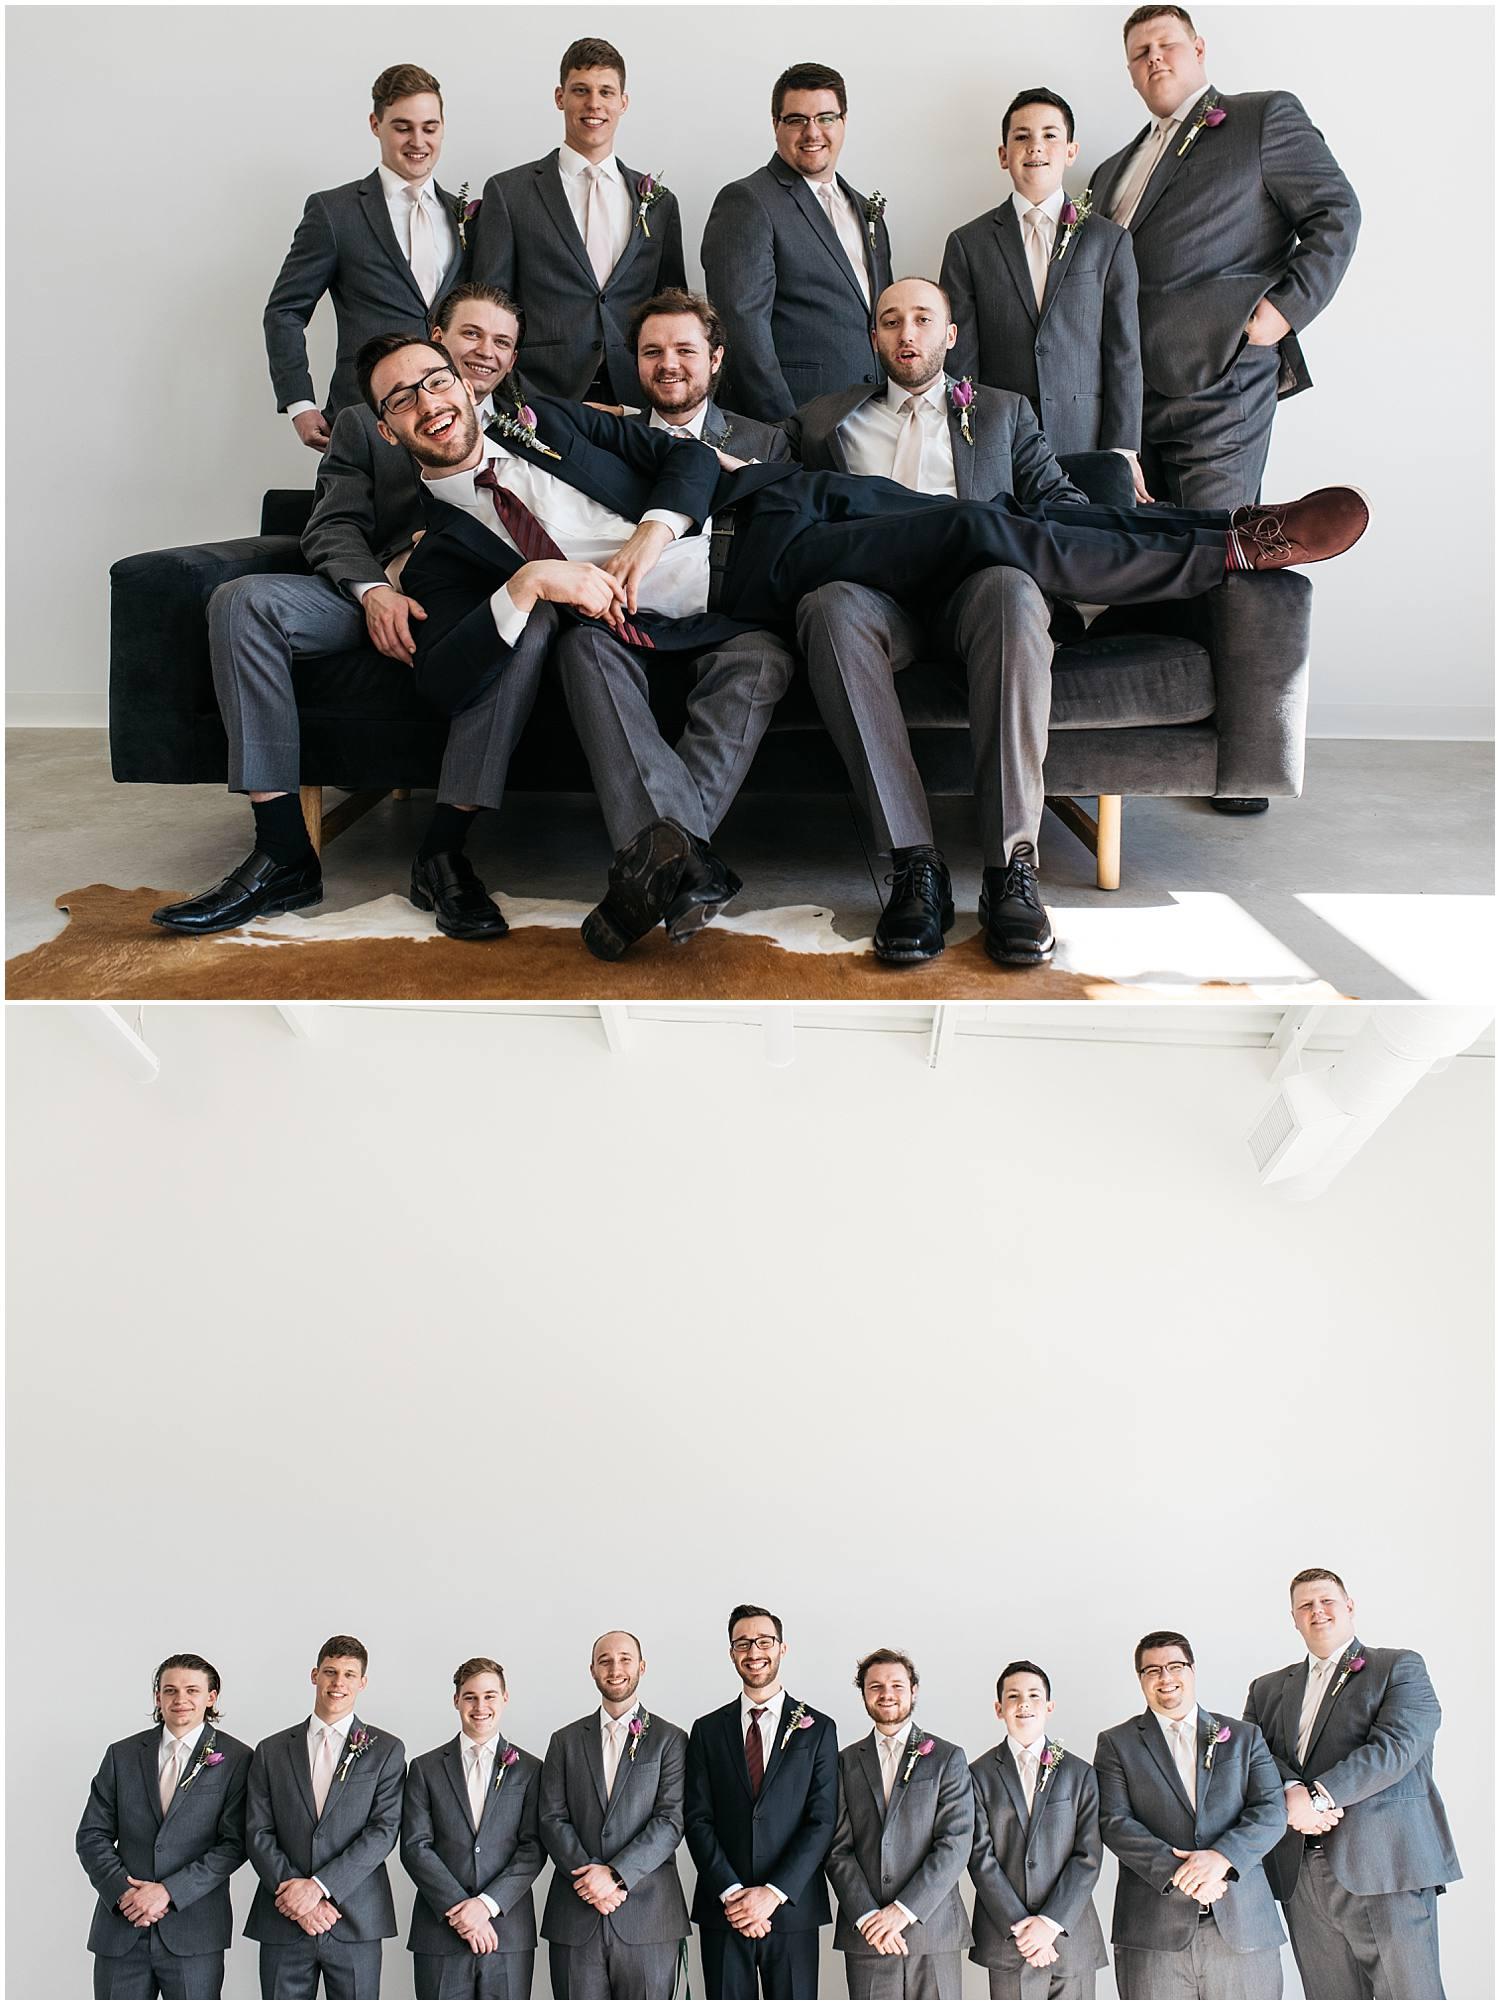 Josh - Emily - wedding - supply manheim- www.gabemcmullen.com42.jpg